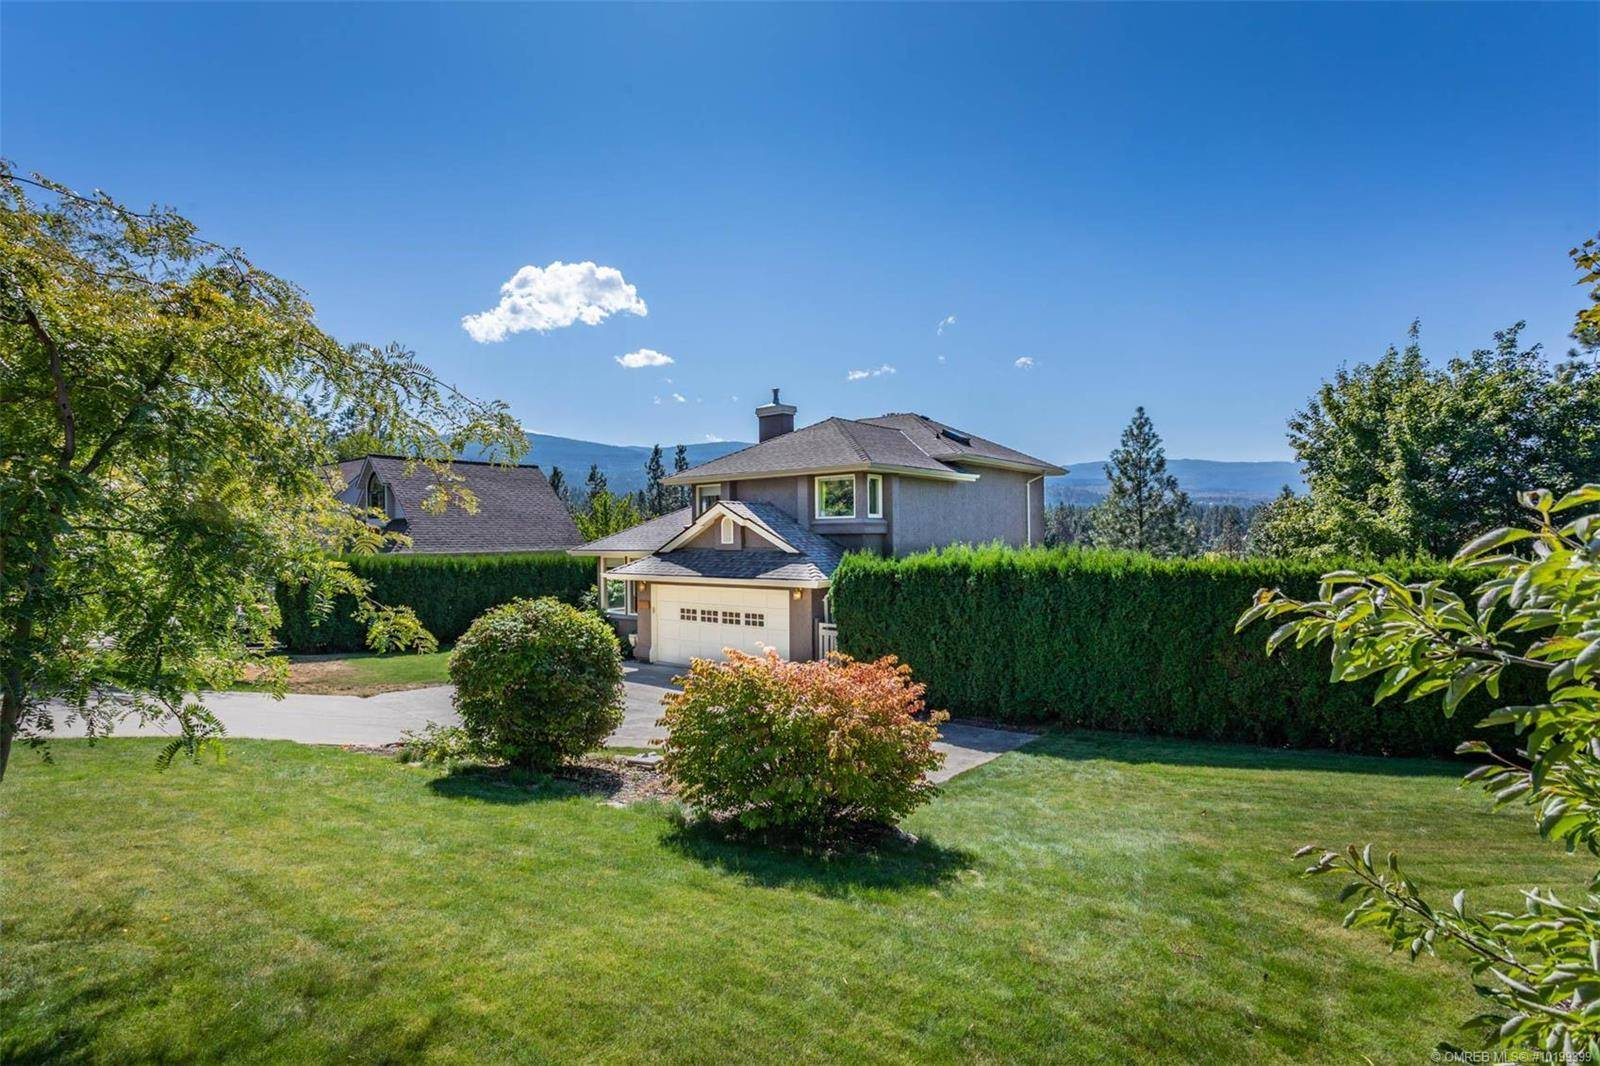 House for sale at 3886 Hyak Rd Kelowna British Columbia - MLS: 10199399